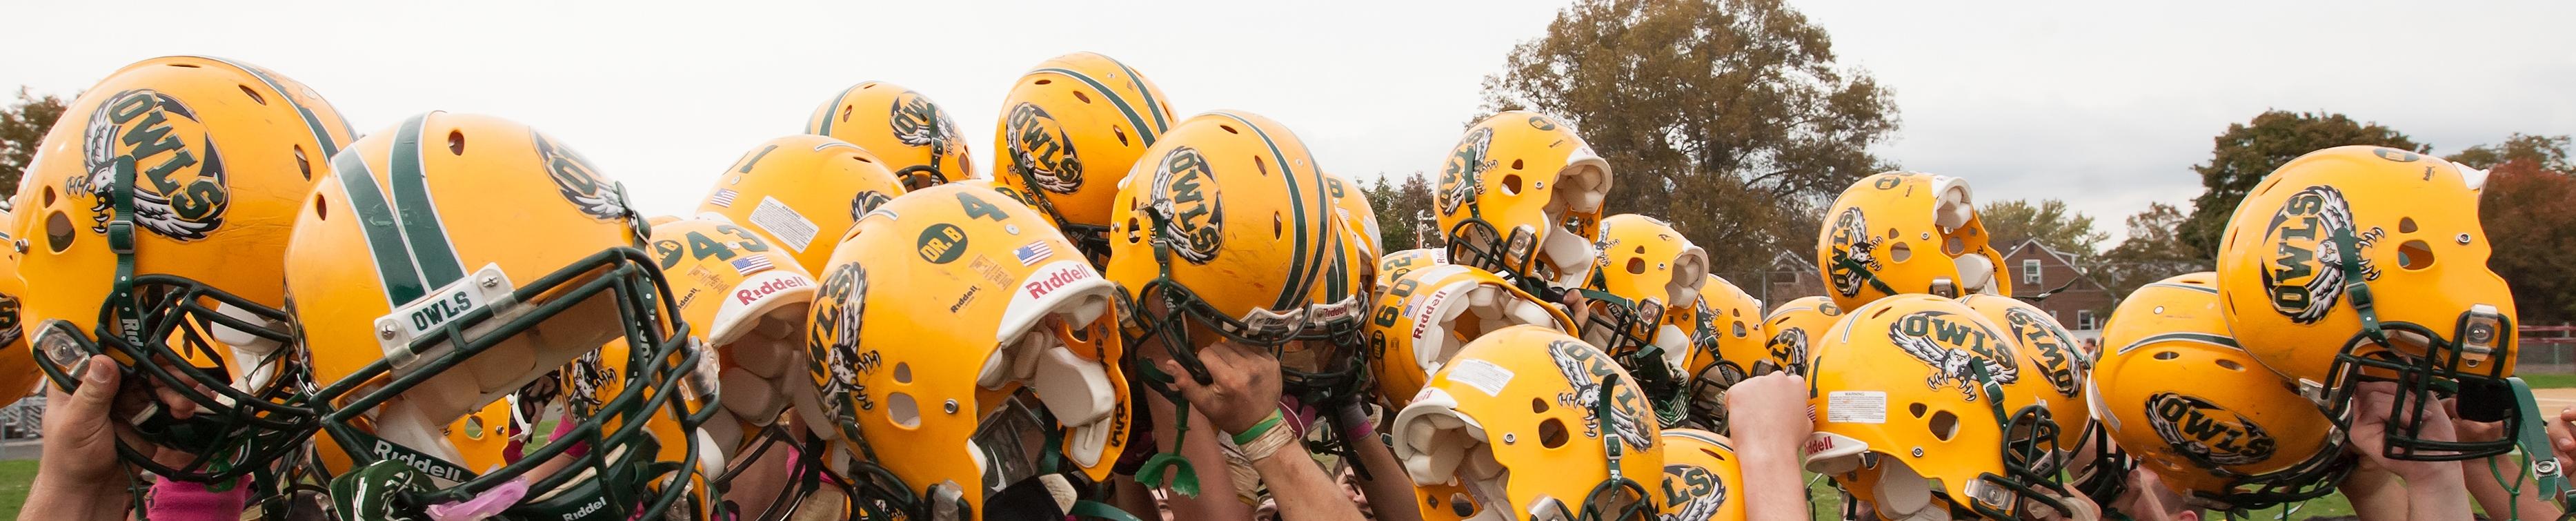 Team Helmets.jpg